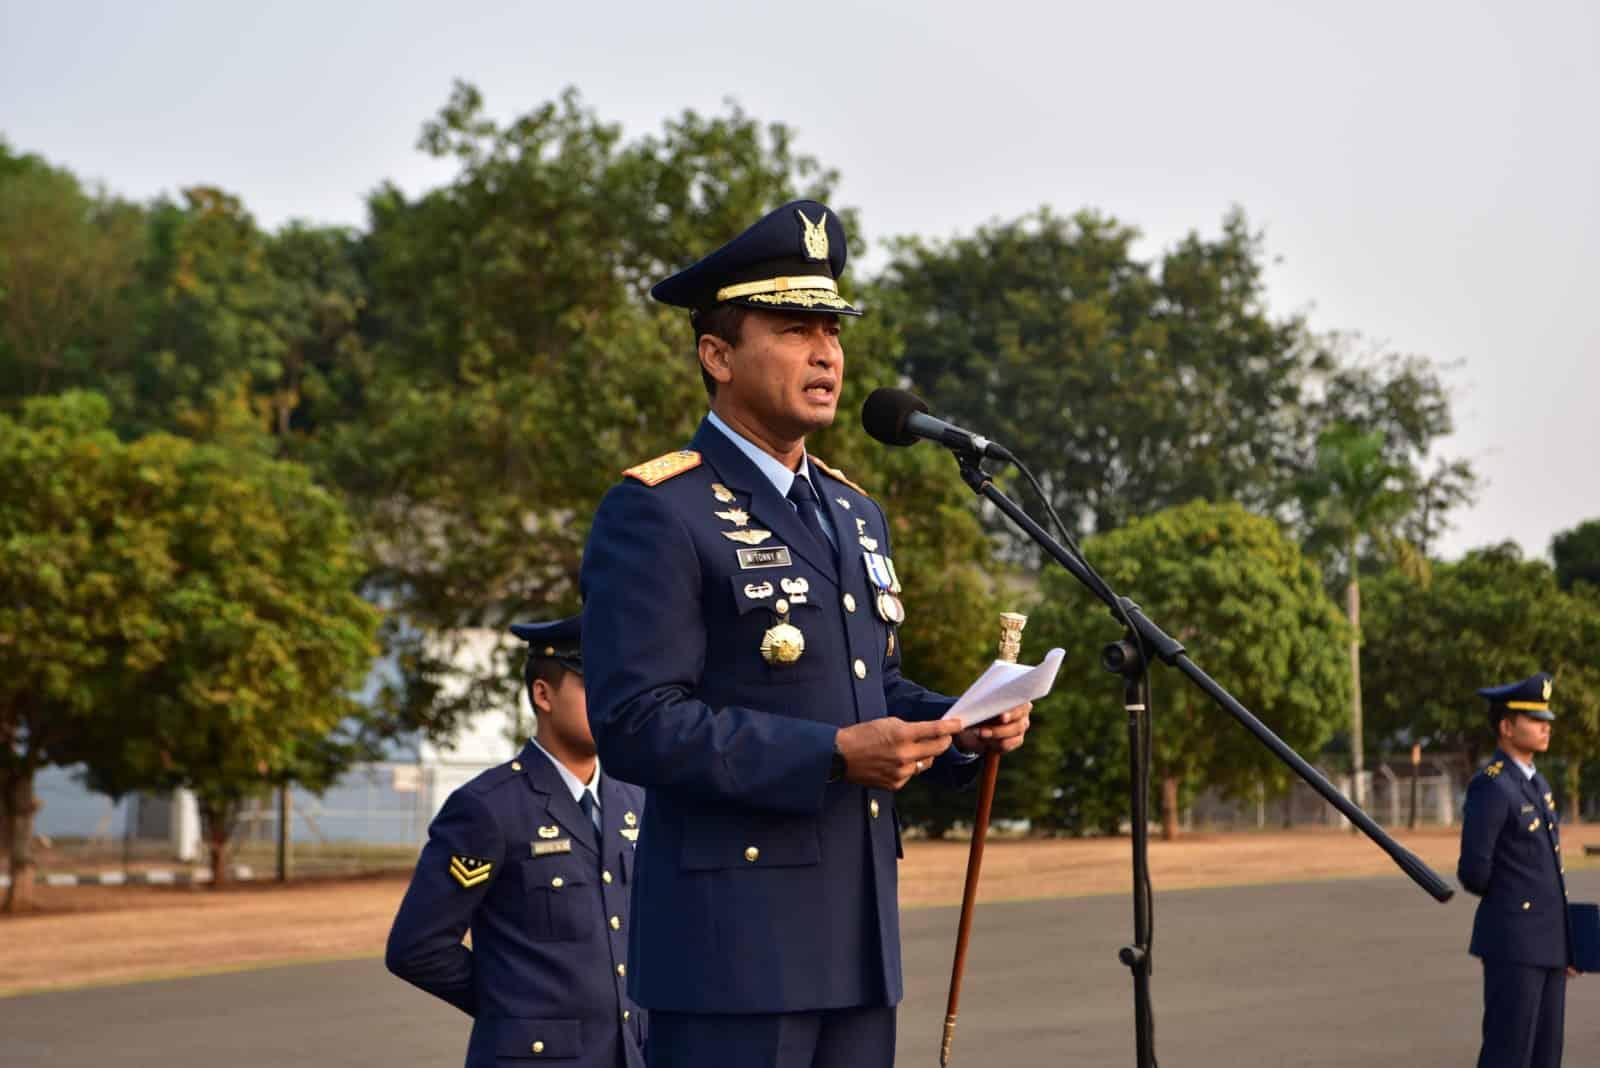 Realisasikan Indonesia Emas 2045, TNI AU Harus Tangguh